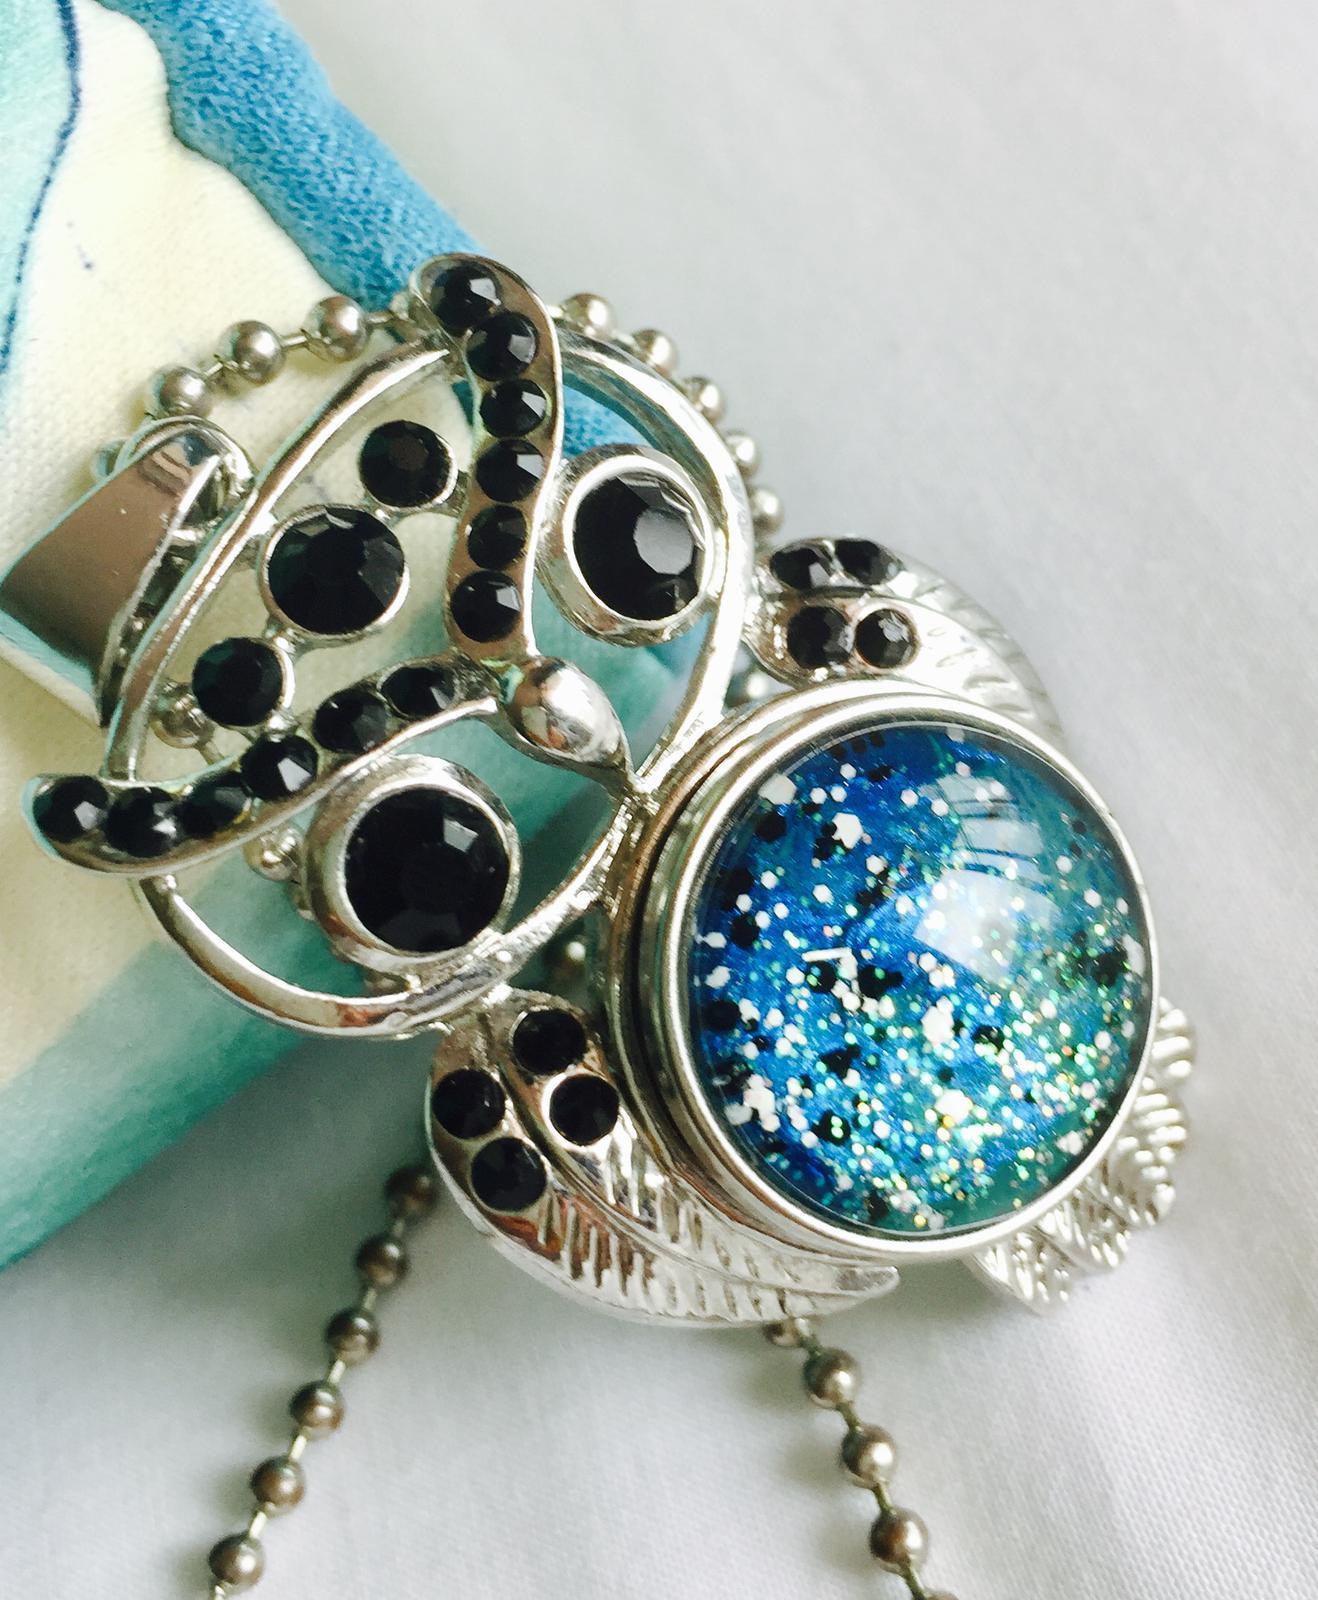 Owl pendant with insert